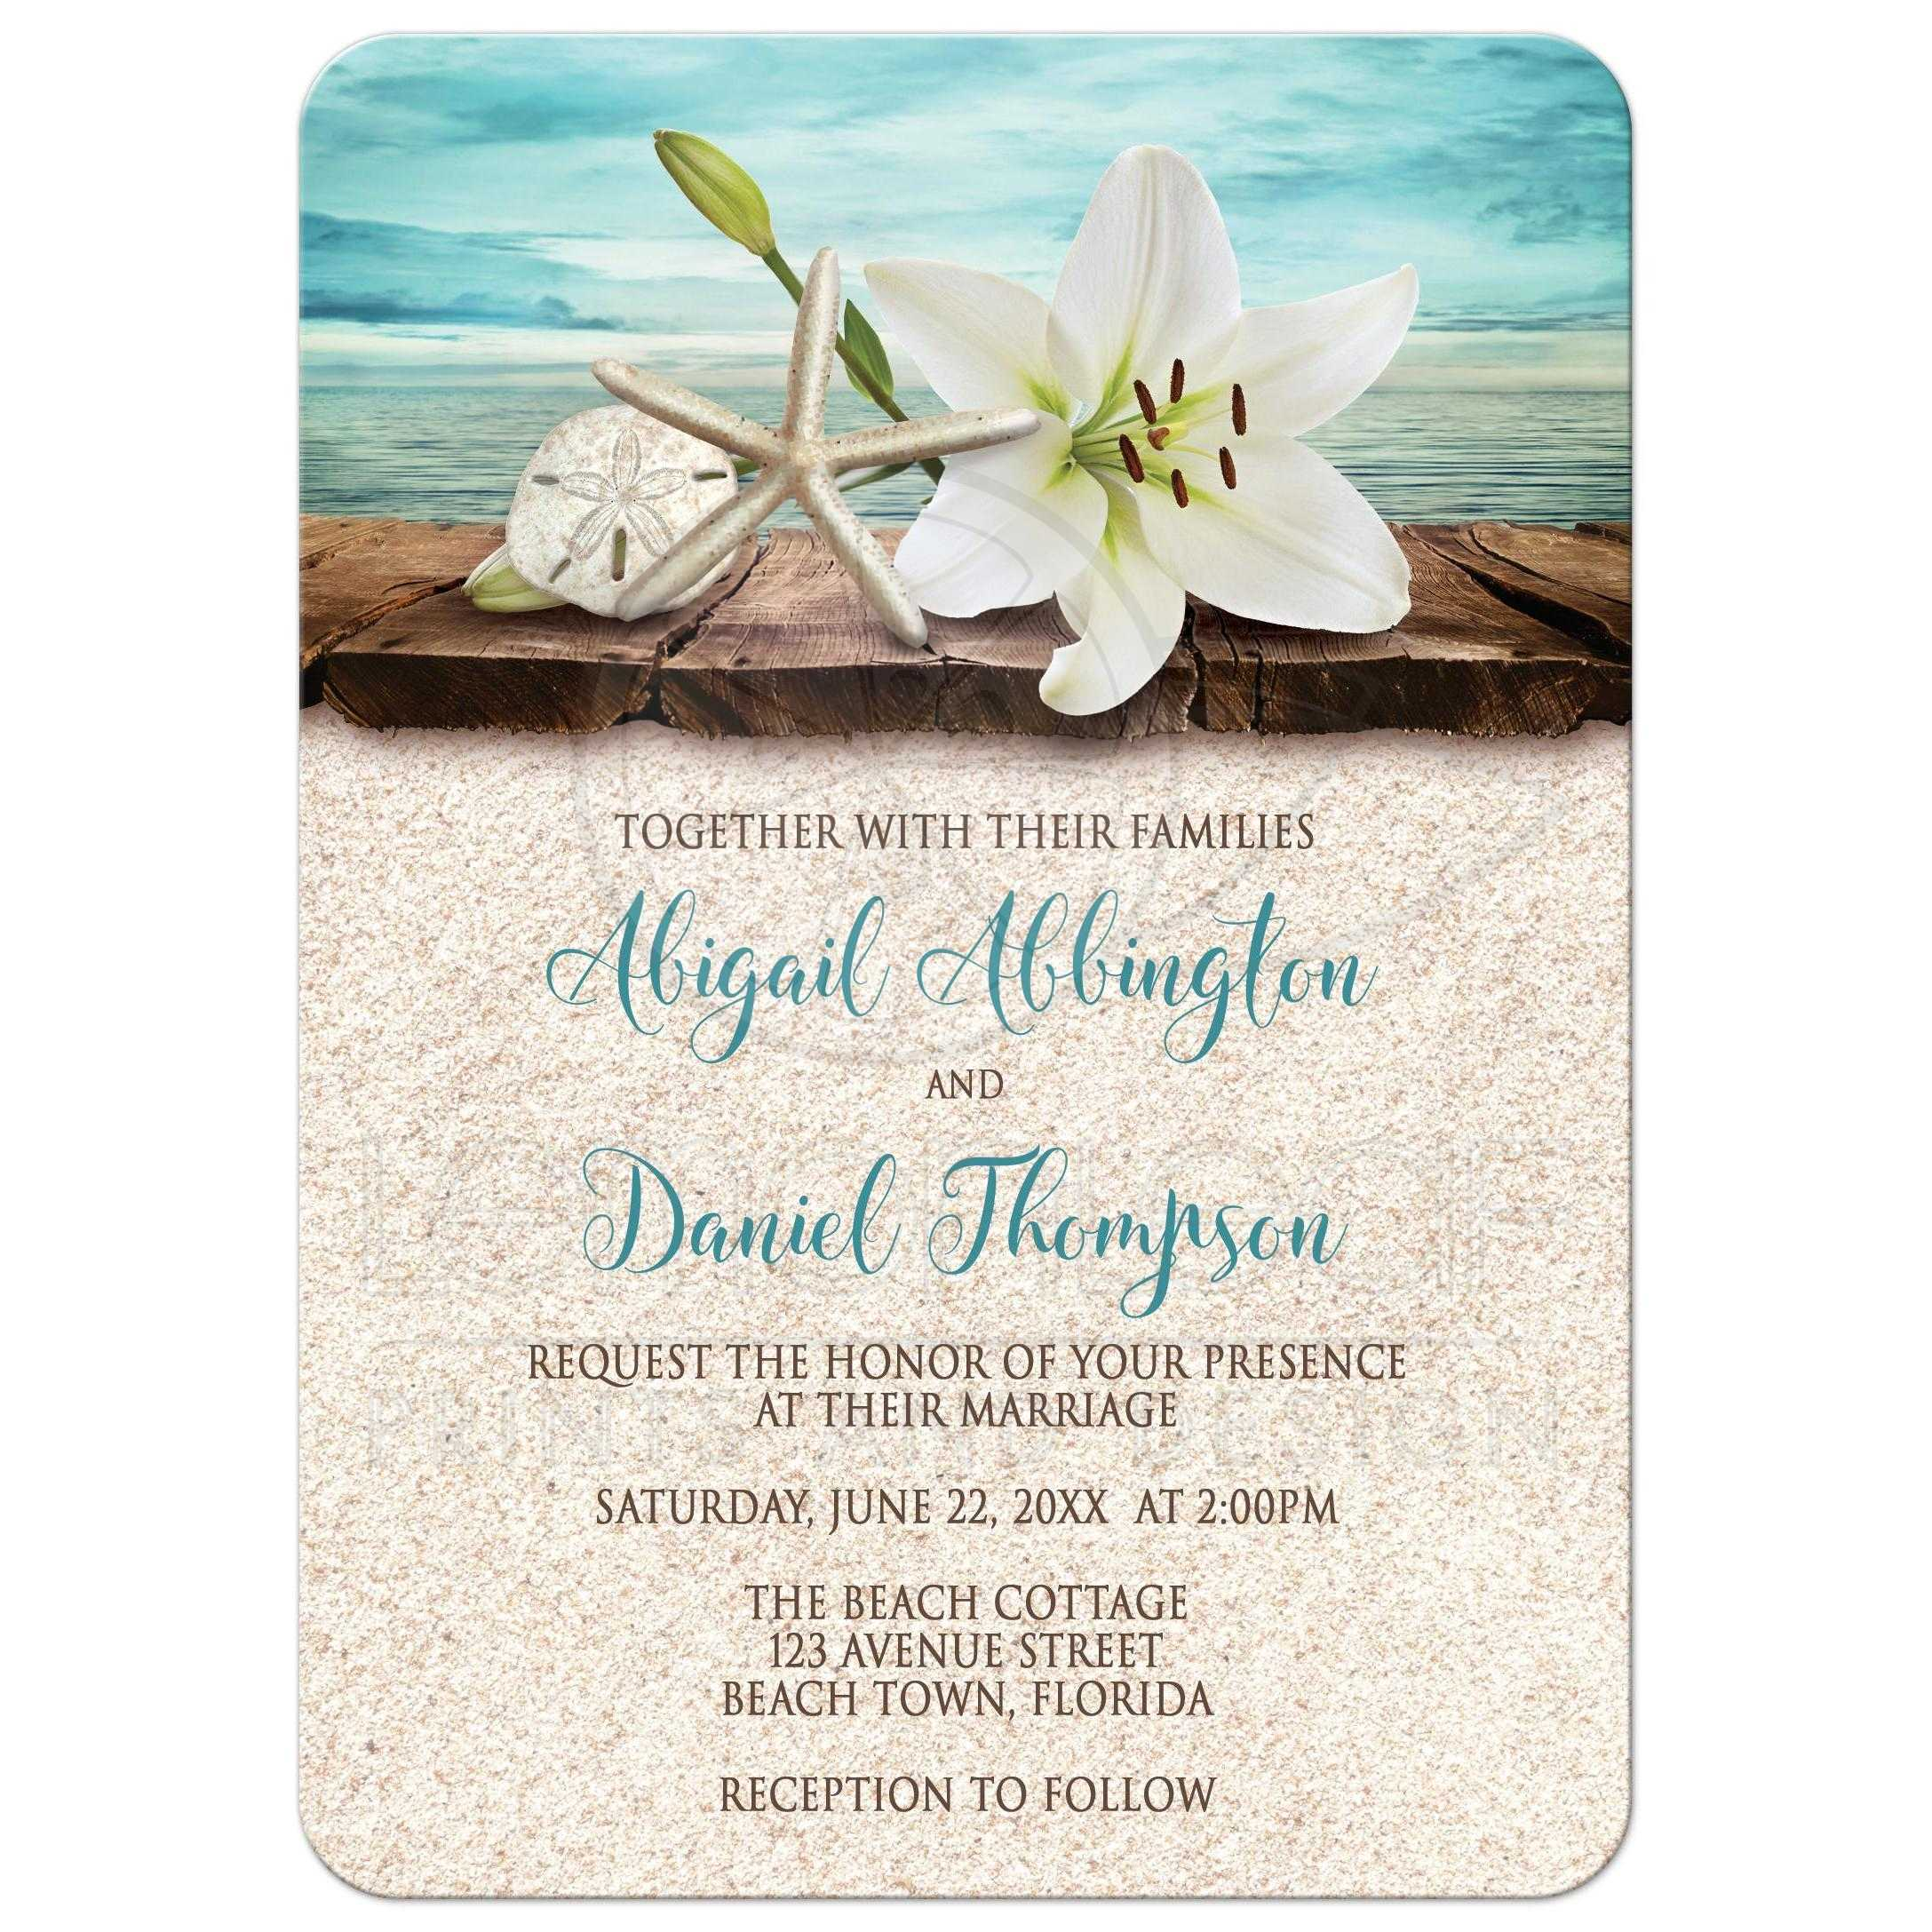 beach wedding invitations - Boat.jeremyeaton.co